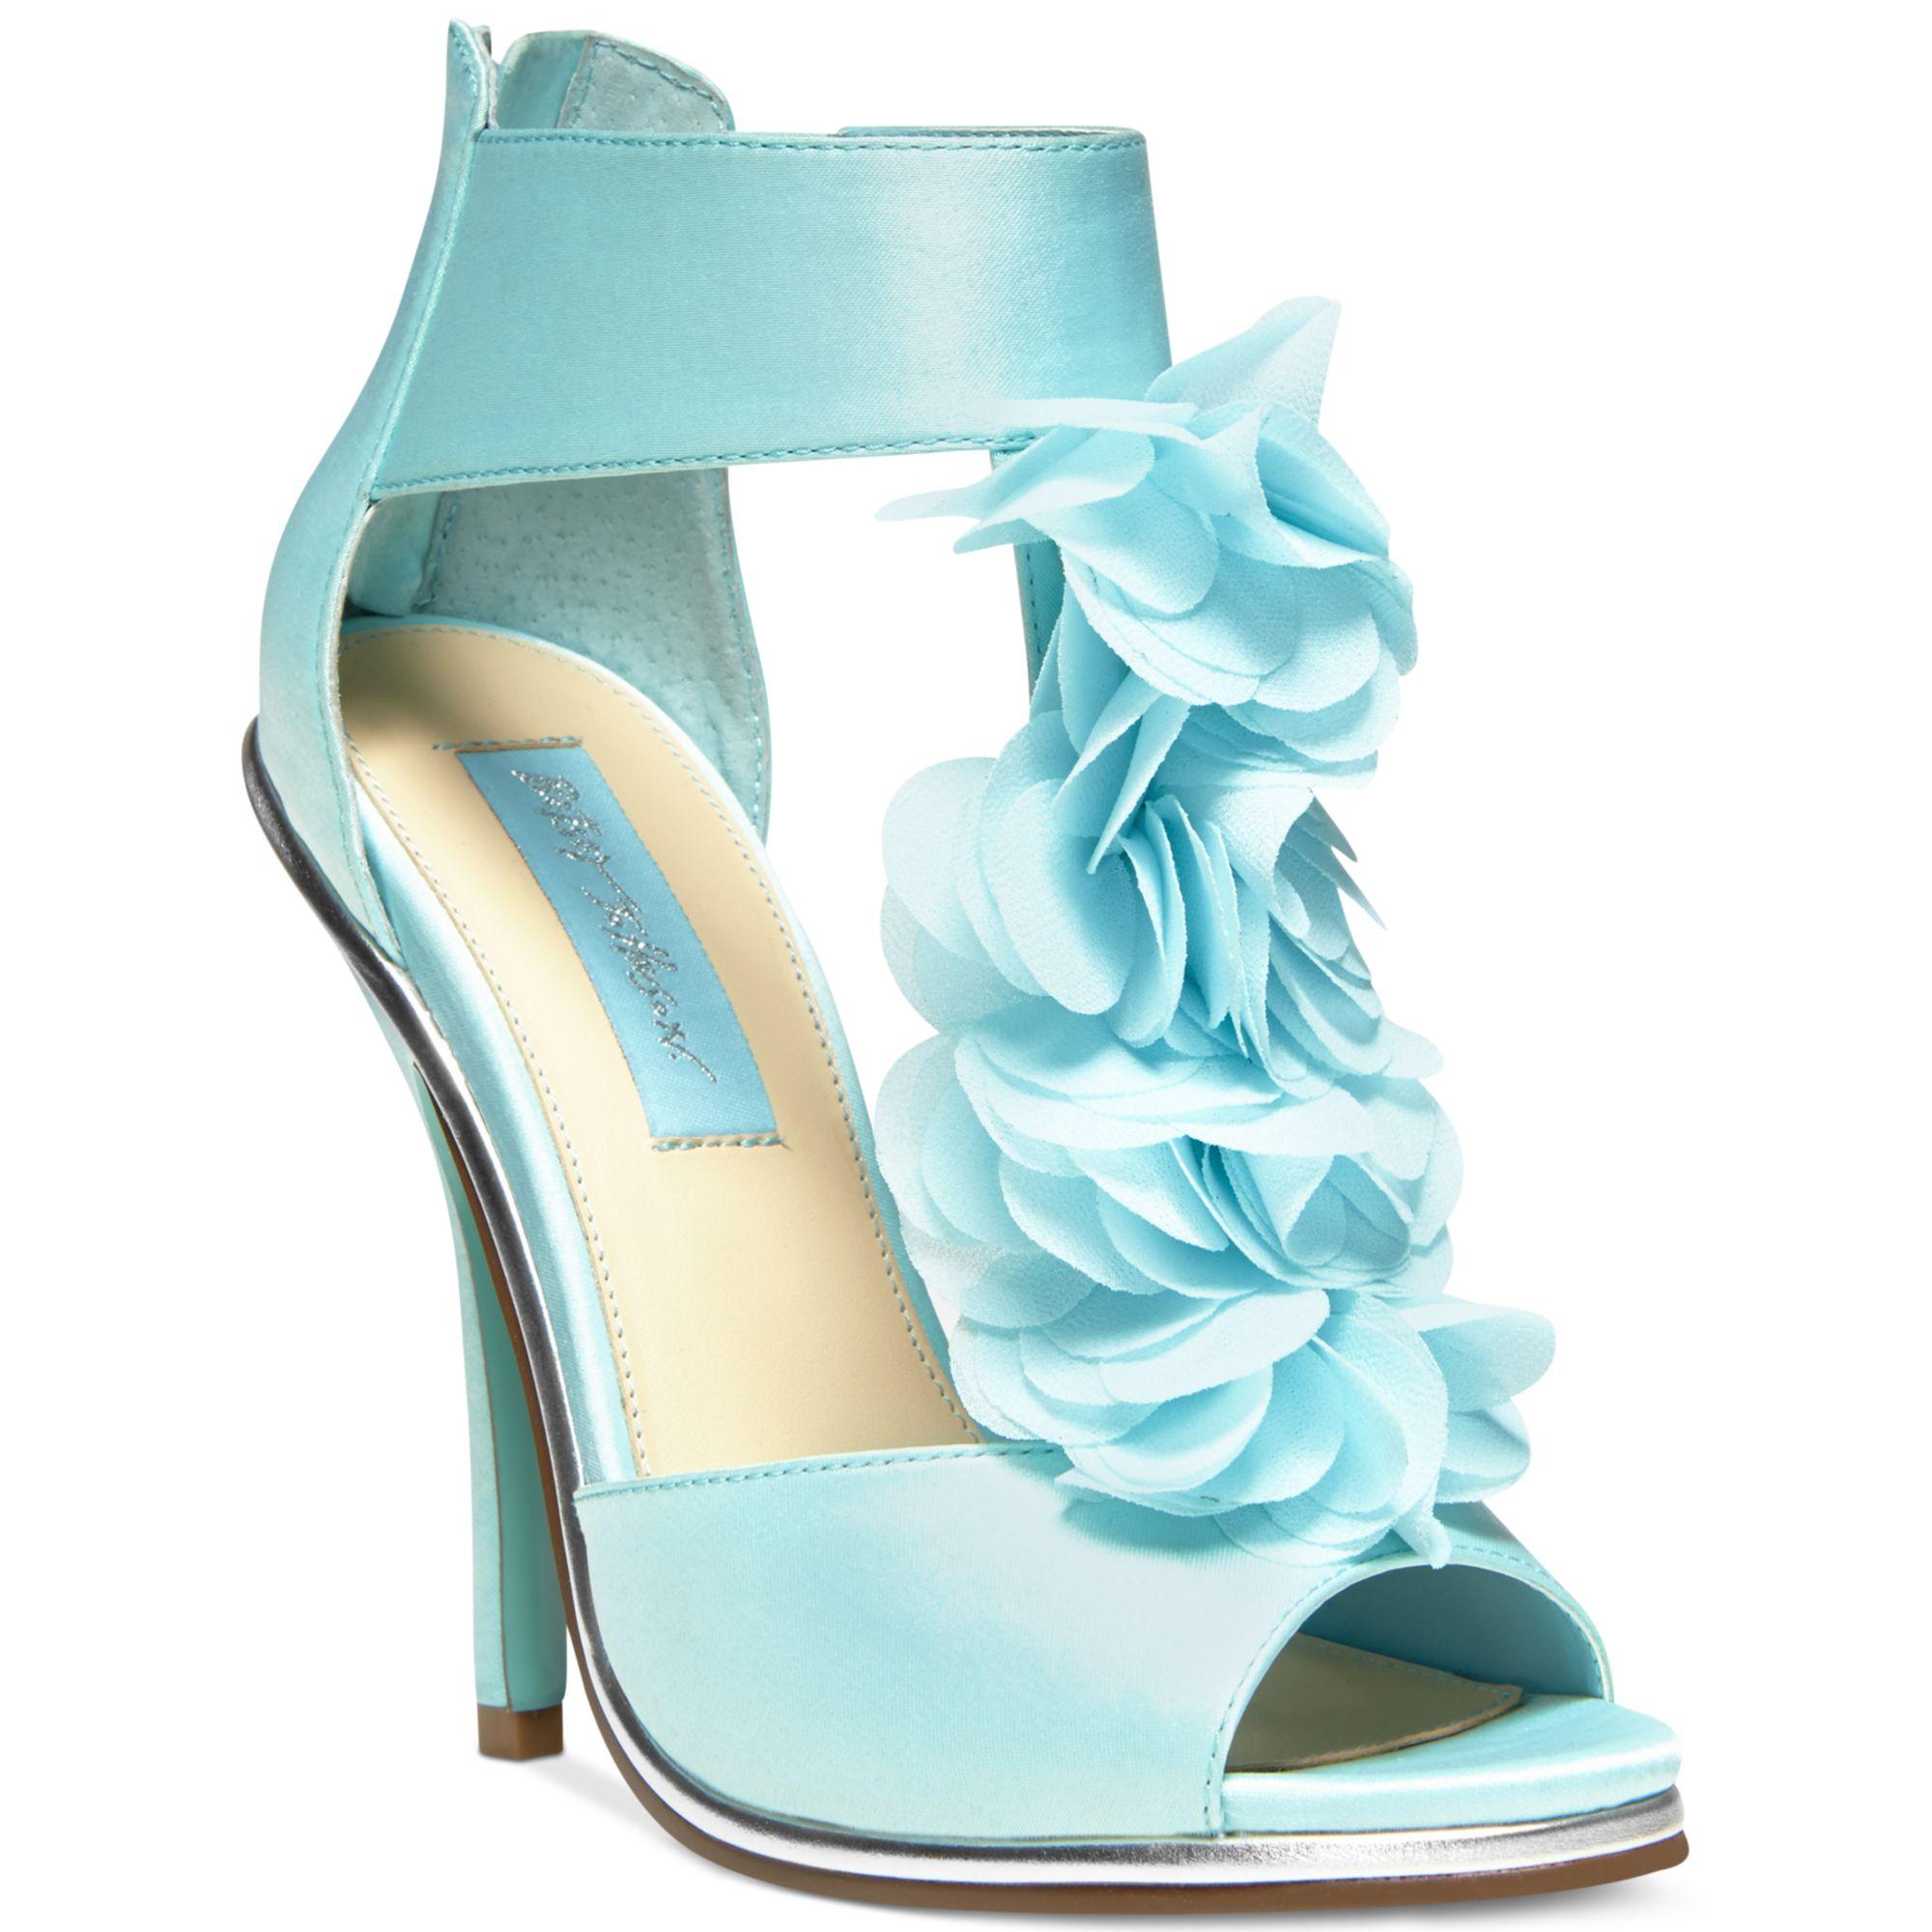 Betsey Johnson Blue By Bloom Evening Platform Sandals In Blue | Lyst